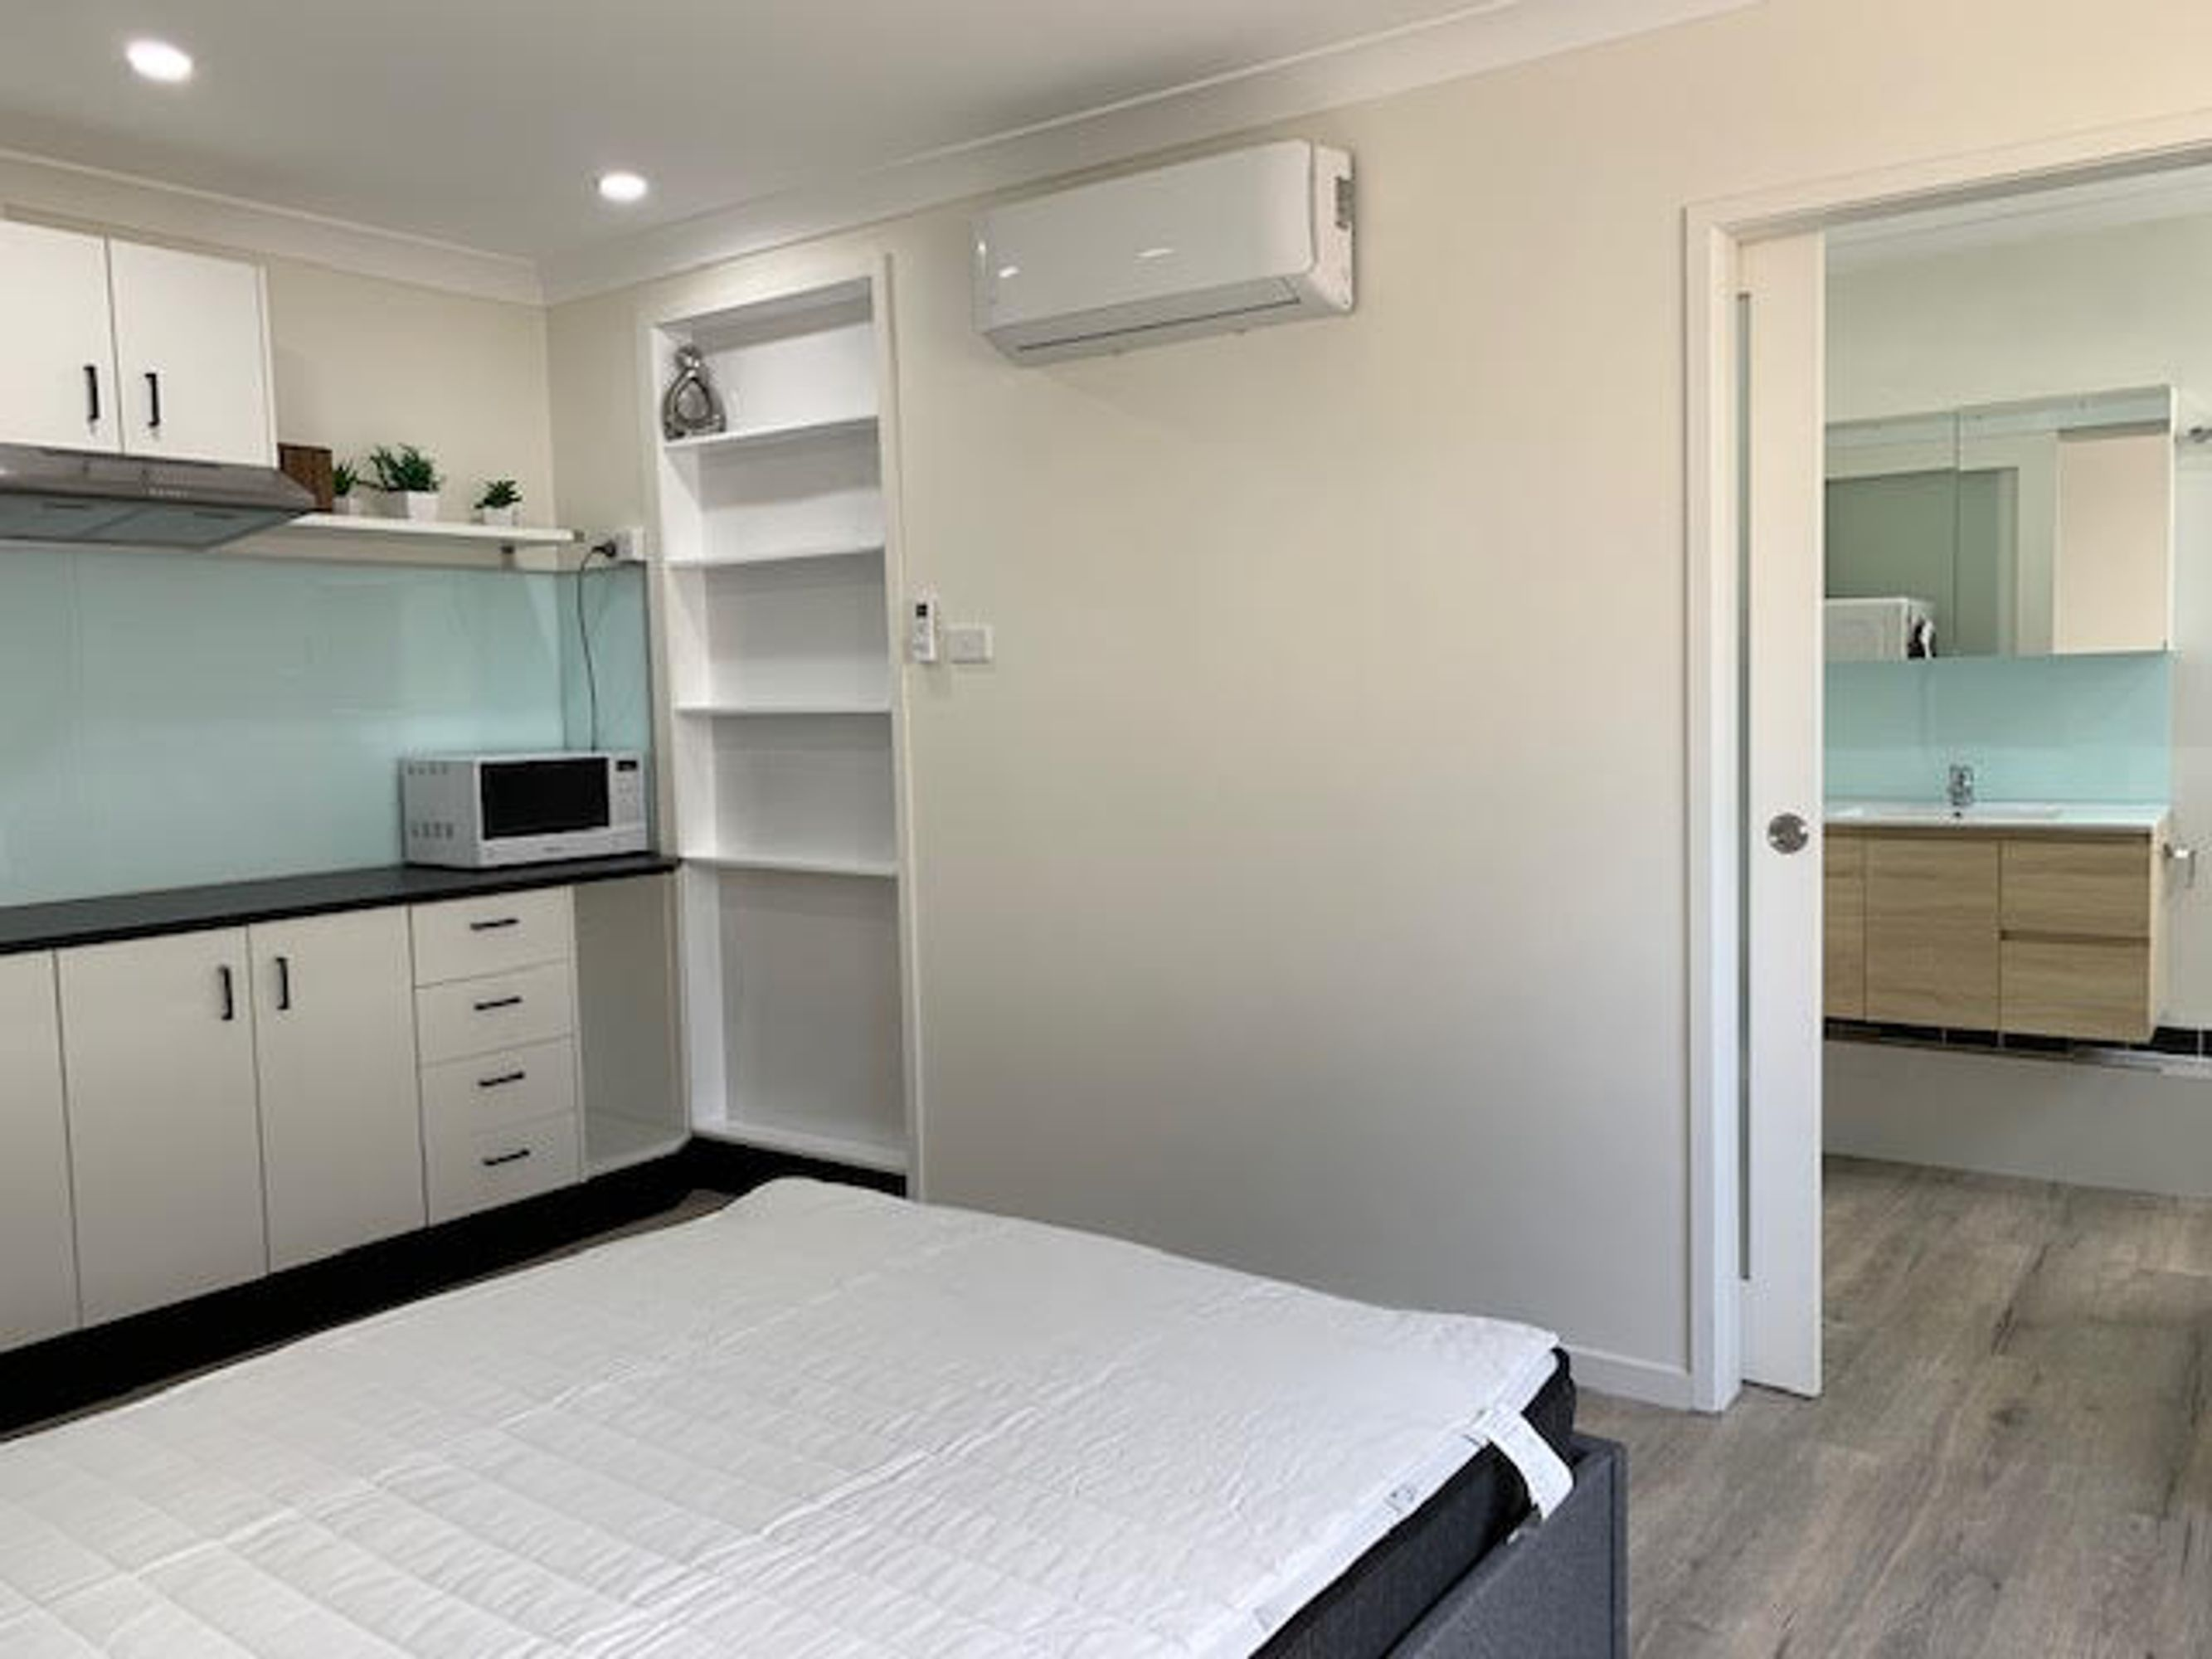 24a/15 Cavill Avenue, Surfers Paradise, QLD 4217